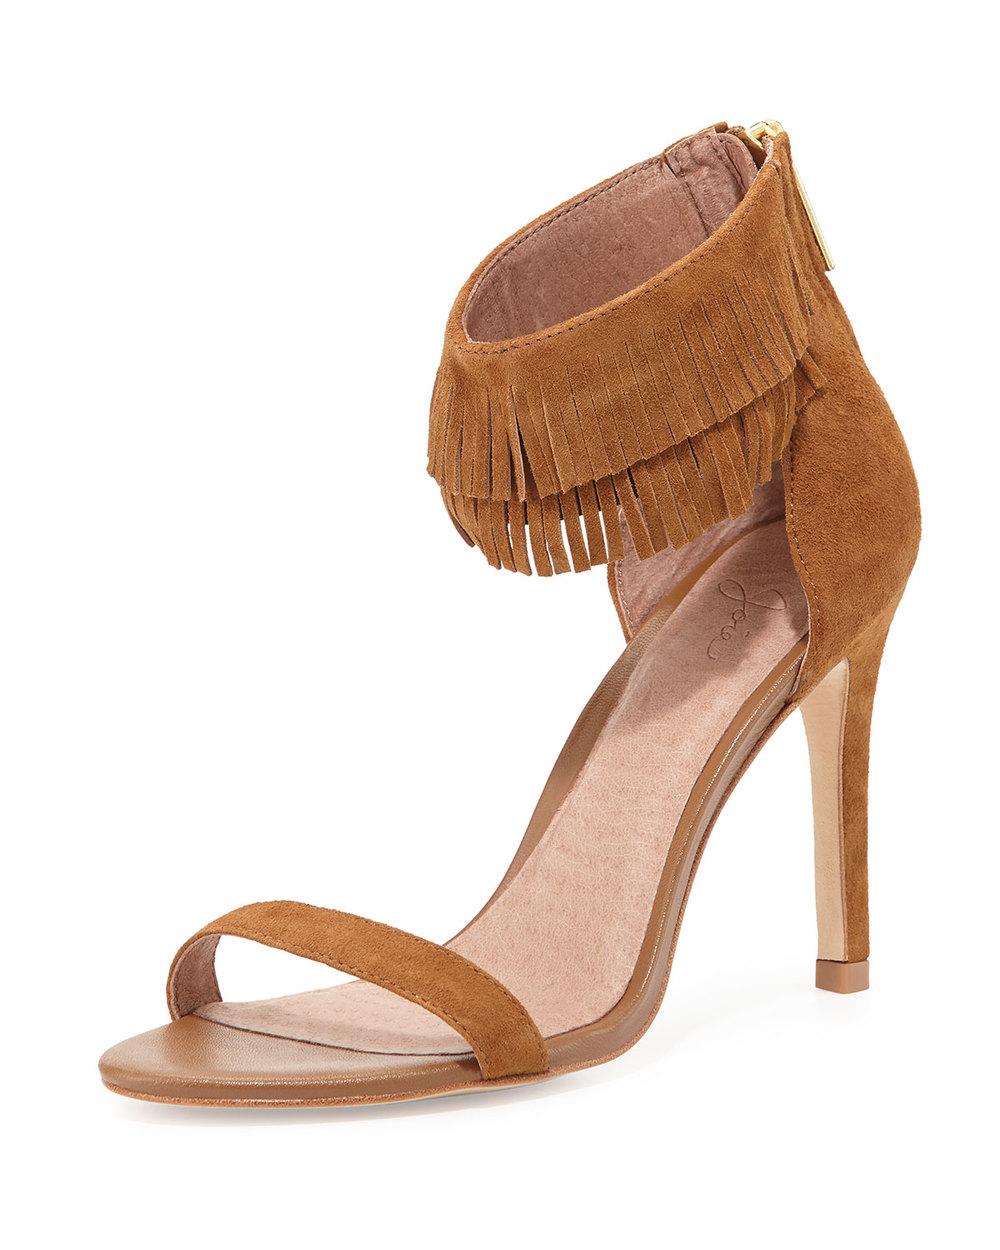 Joie Suede Fringe-Cuff Sandal, Cognac • $117.60 • Neiman Marcus